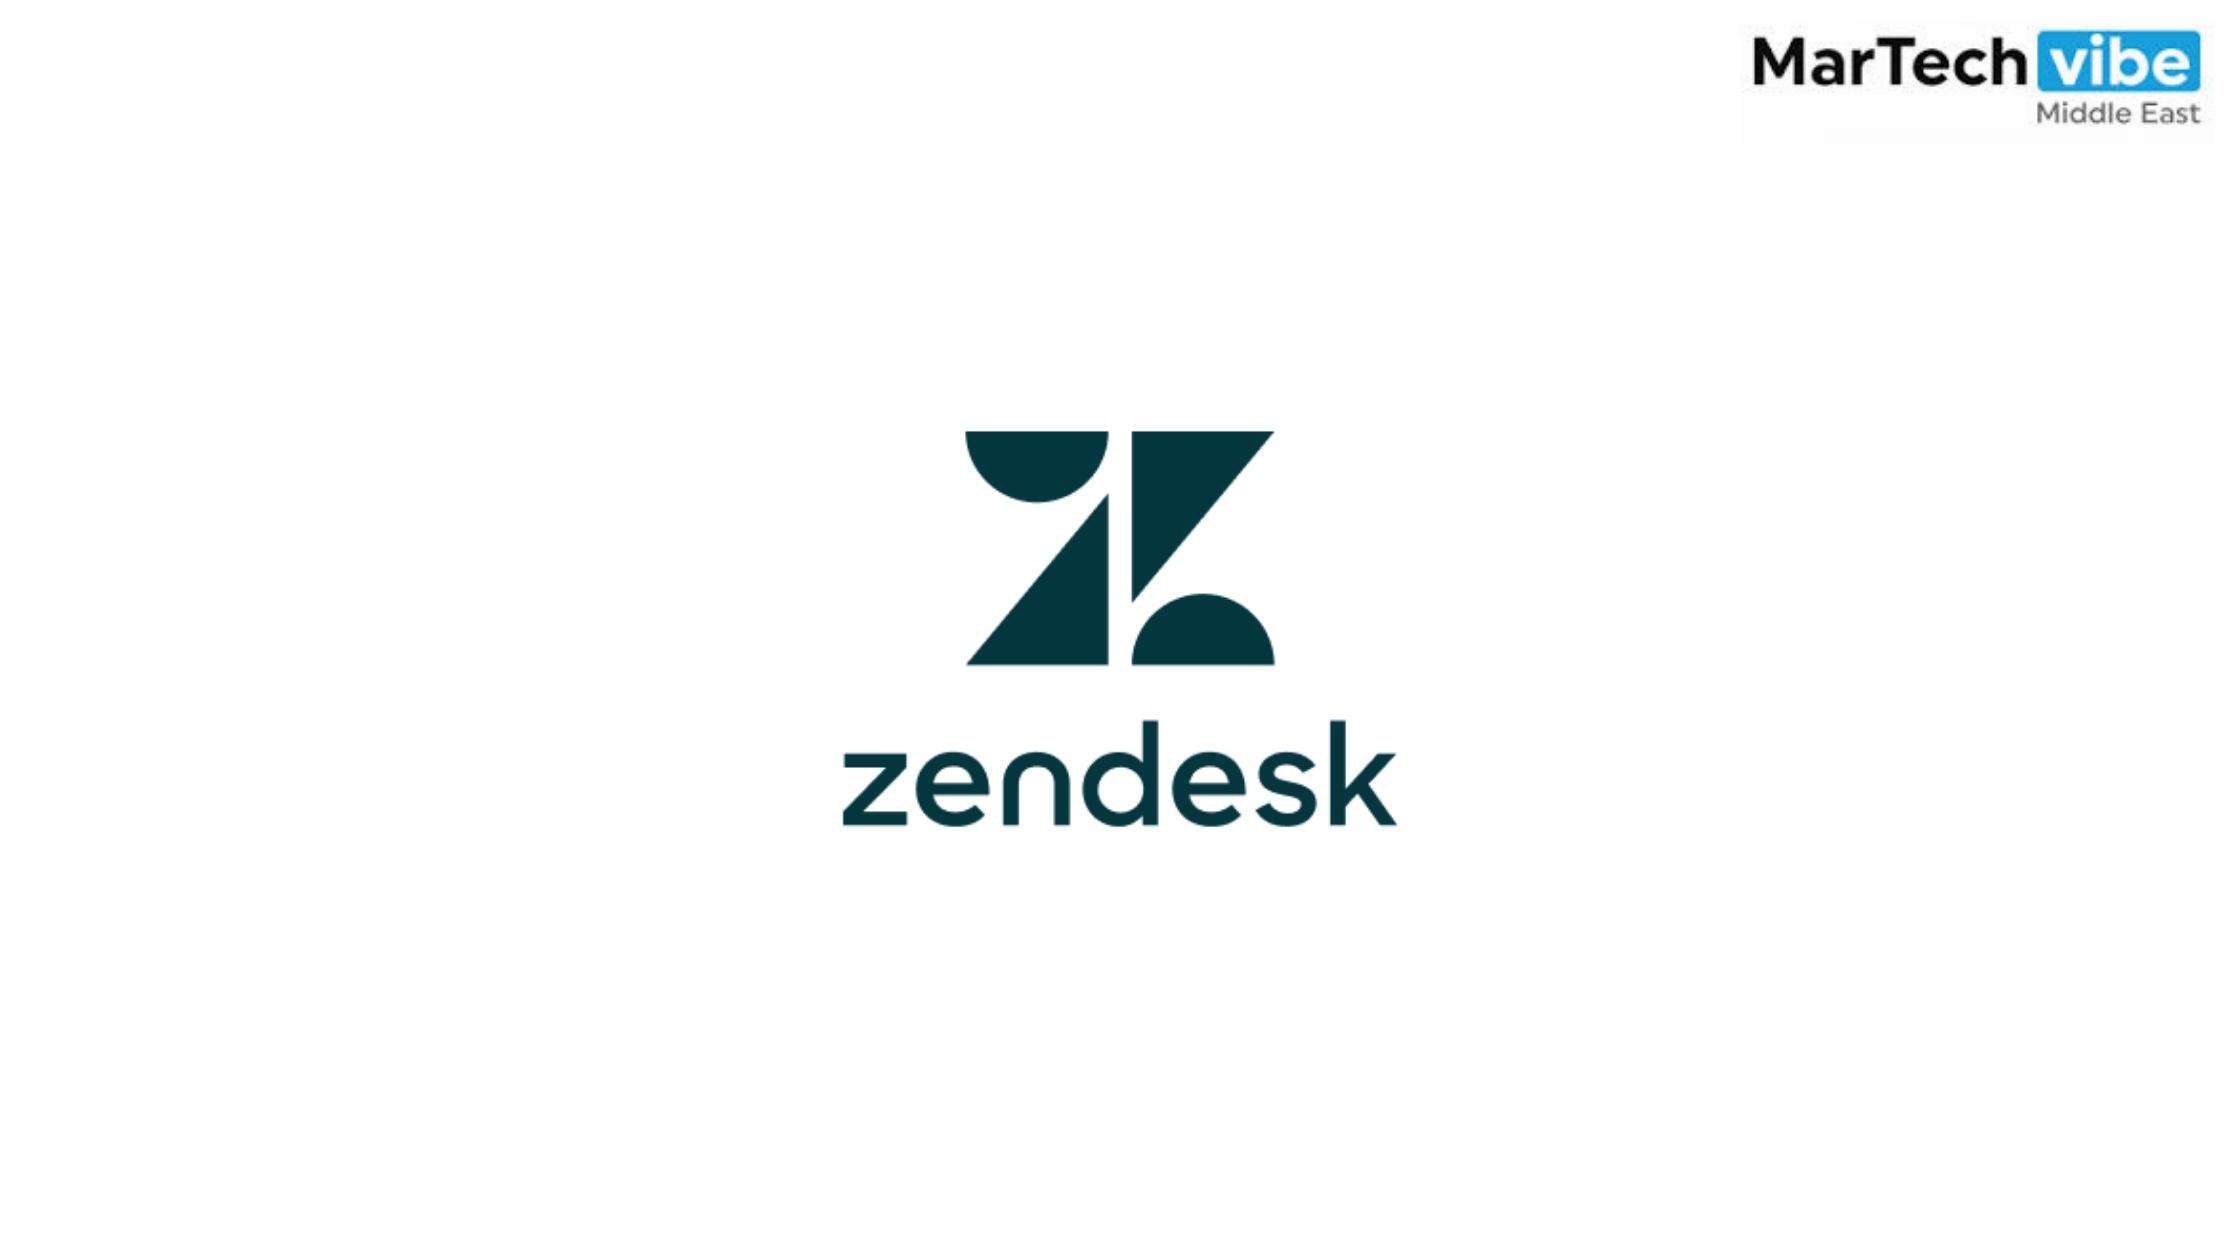 Zendesk Offers Instagram Messaging for Businesses